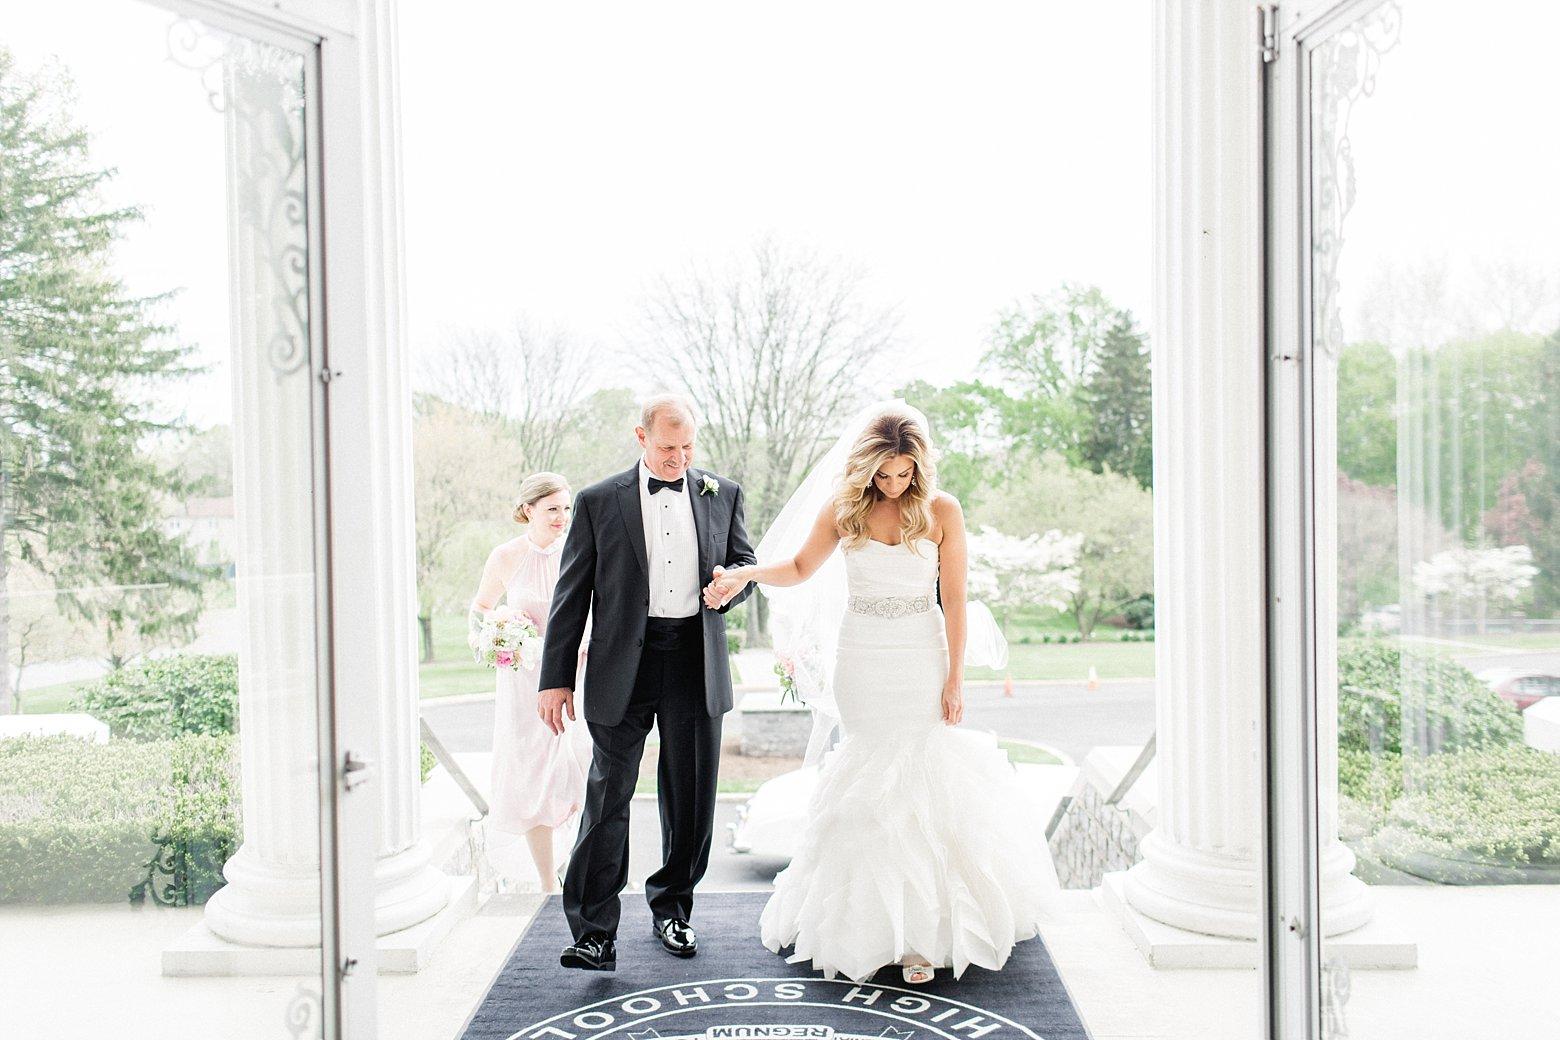 lauren_fair_photography_april_lynn_designs_stasia_matt_spring_cairnwood_estate_wedding_northeast_philadelphia_blush_pink_gold_wedding_invitation_stationery_0045